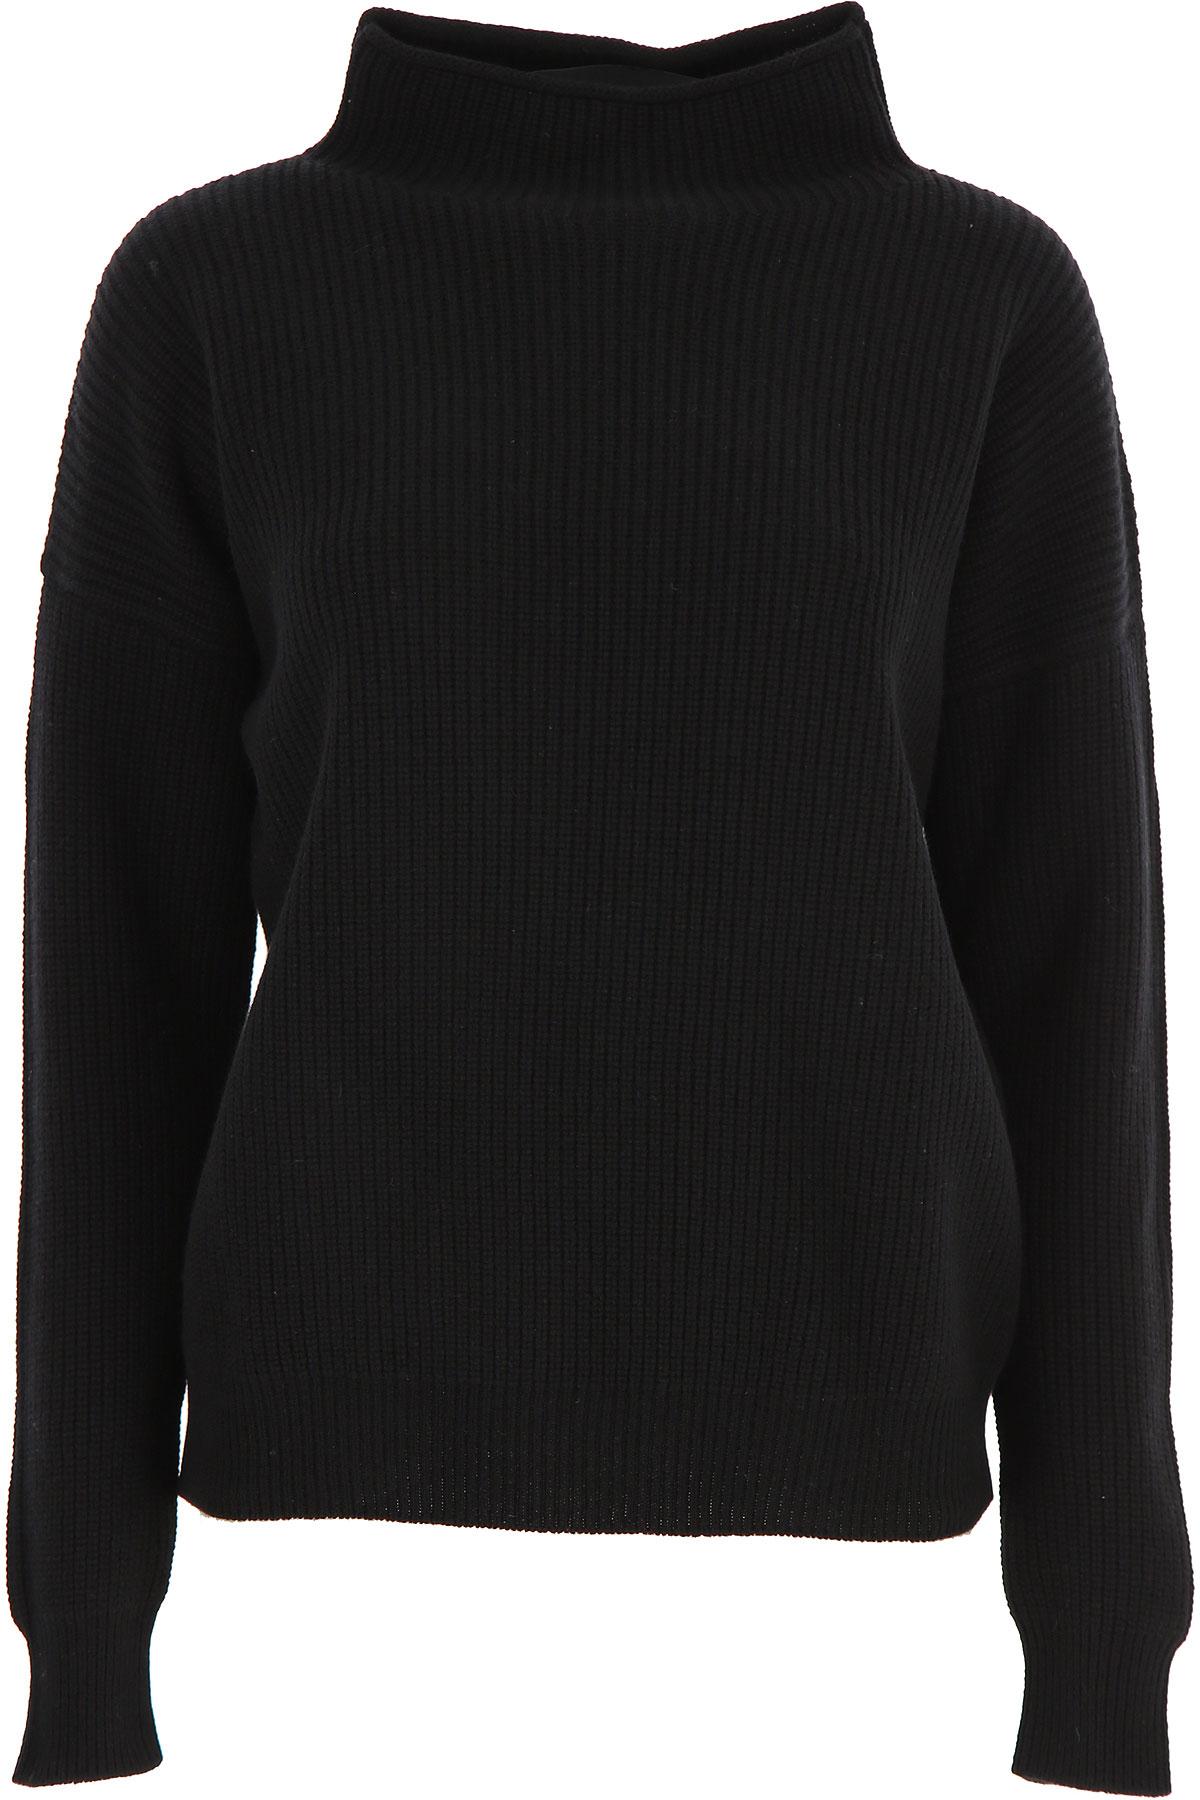 Peserico Sweater for Women Jumper On Sale, Black, Wool, 2019, 10 2 4 6